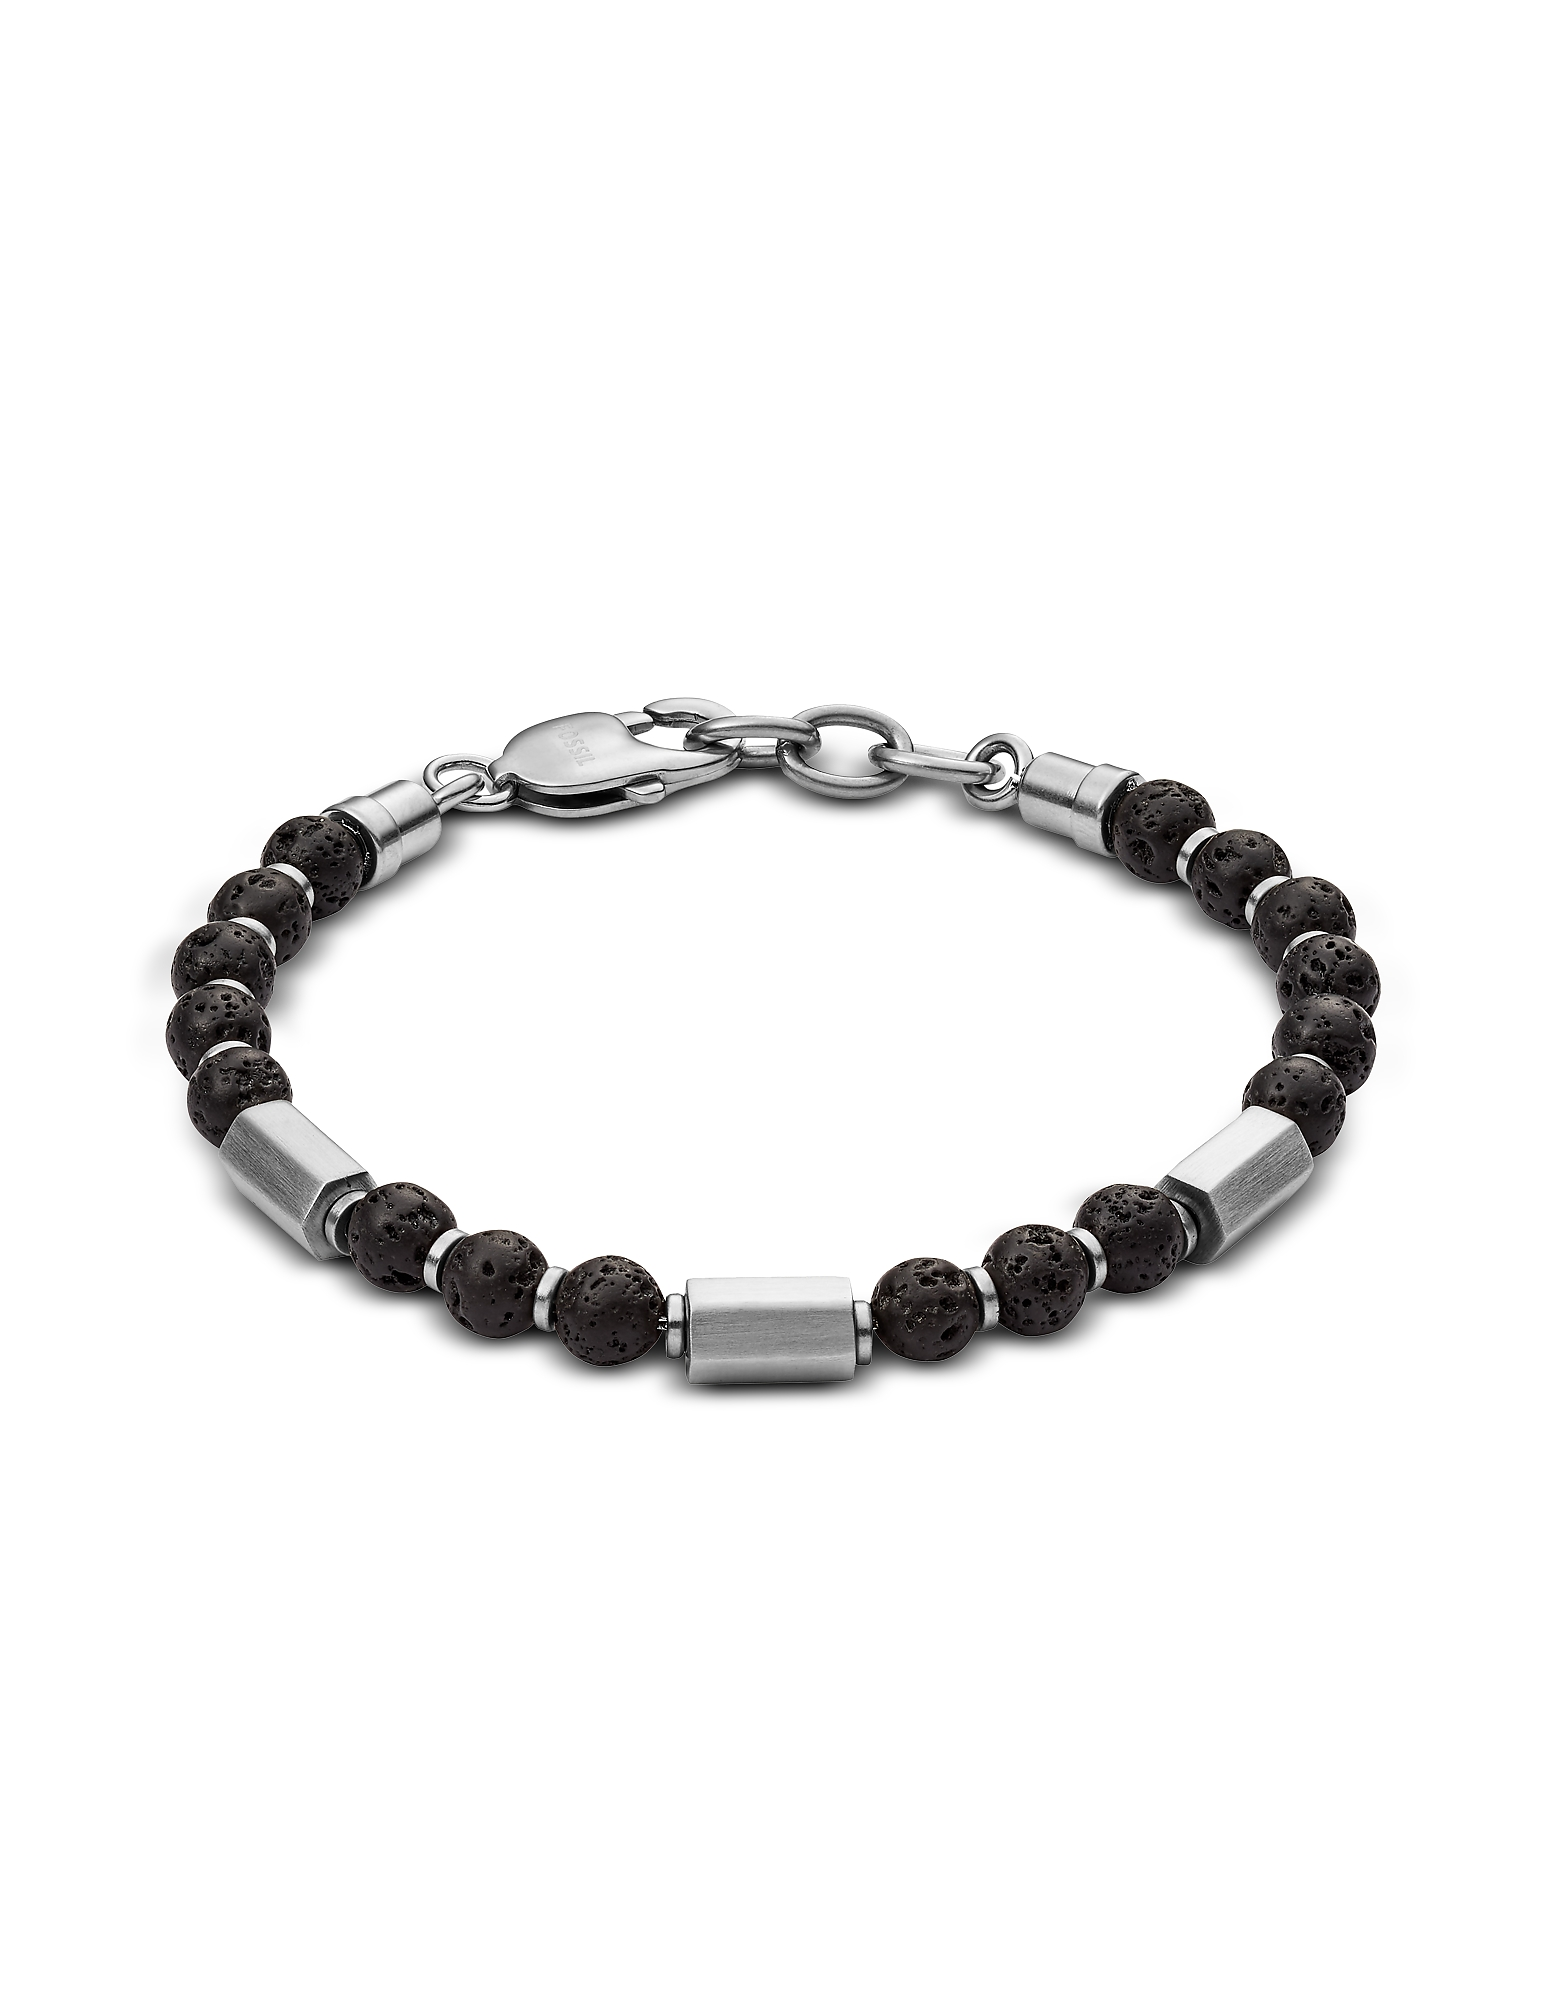 Lava Stone Men's Bracelet, Silver